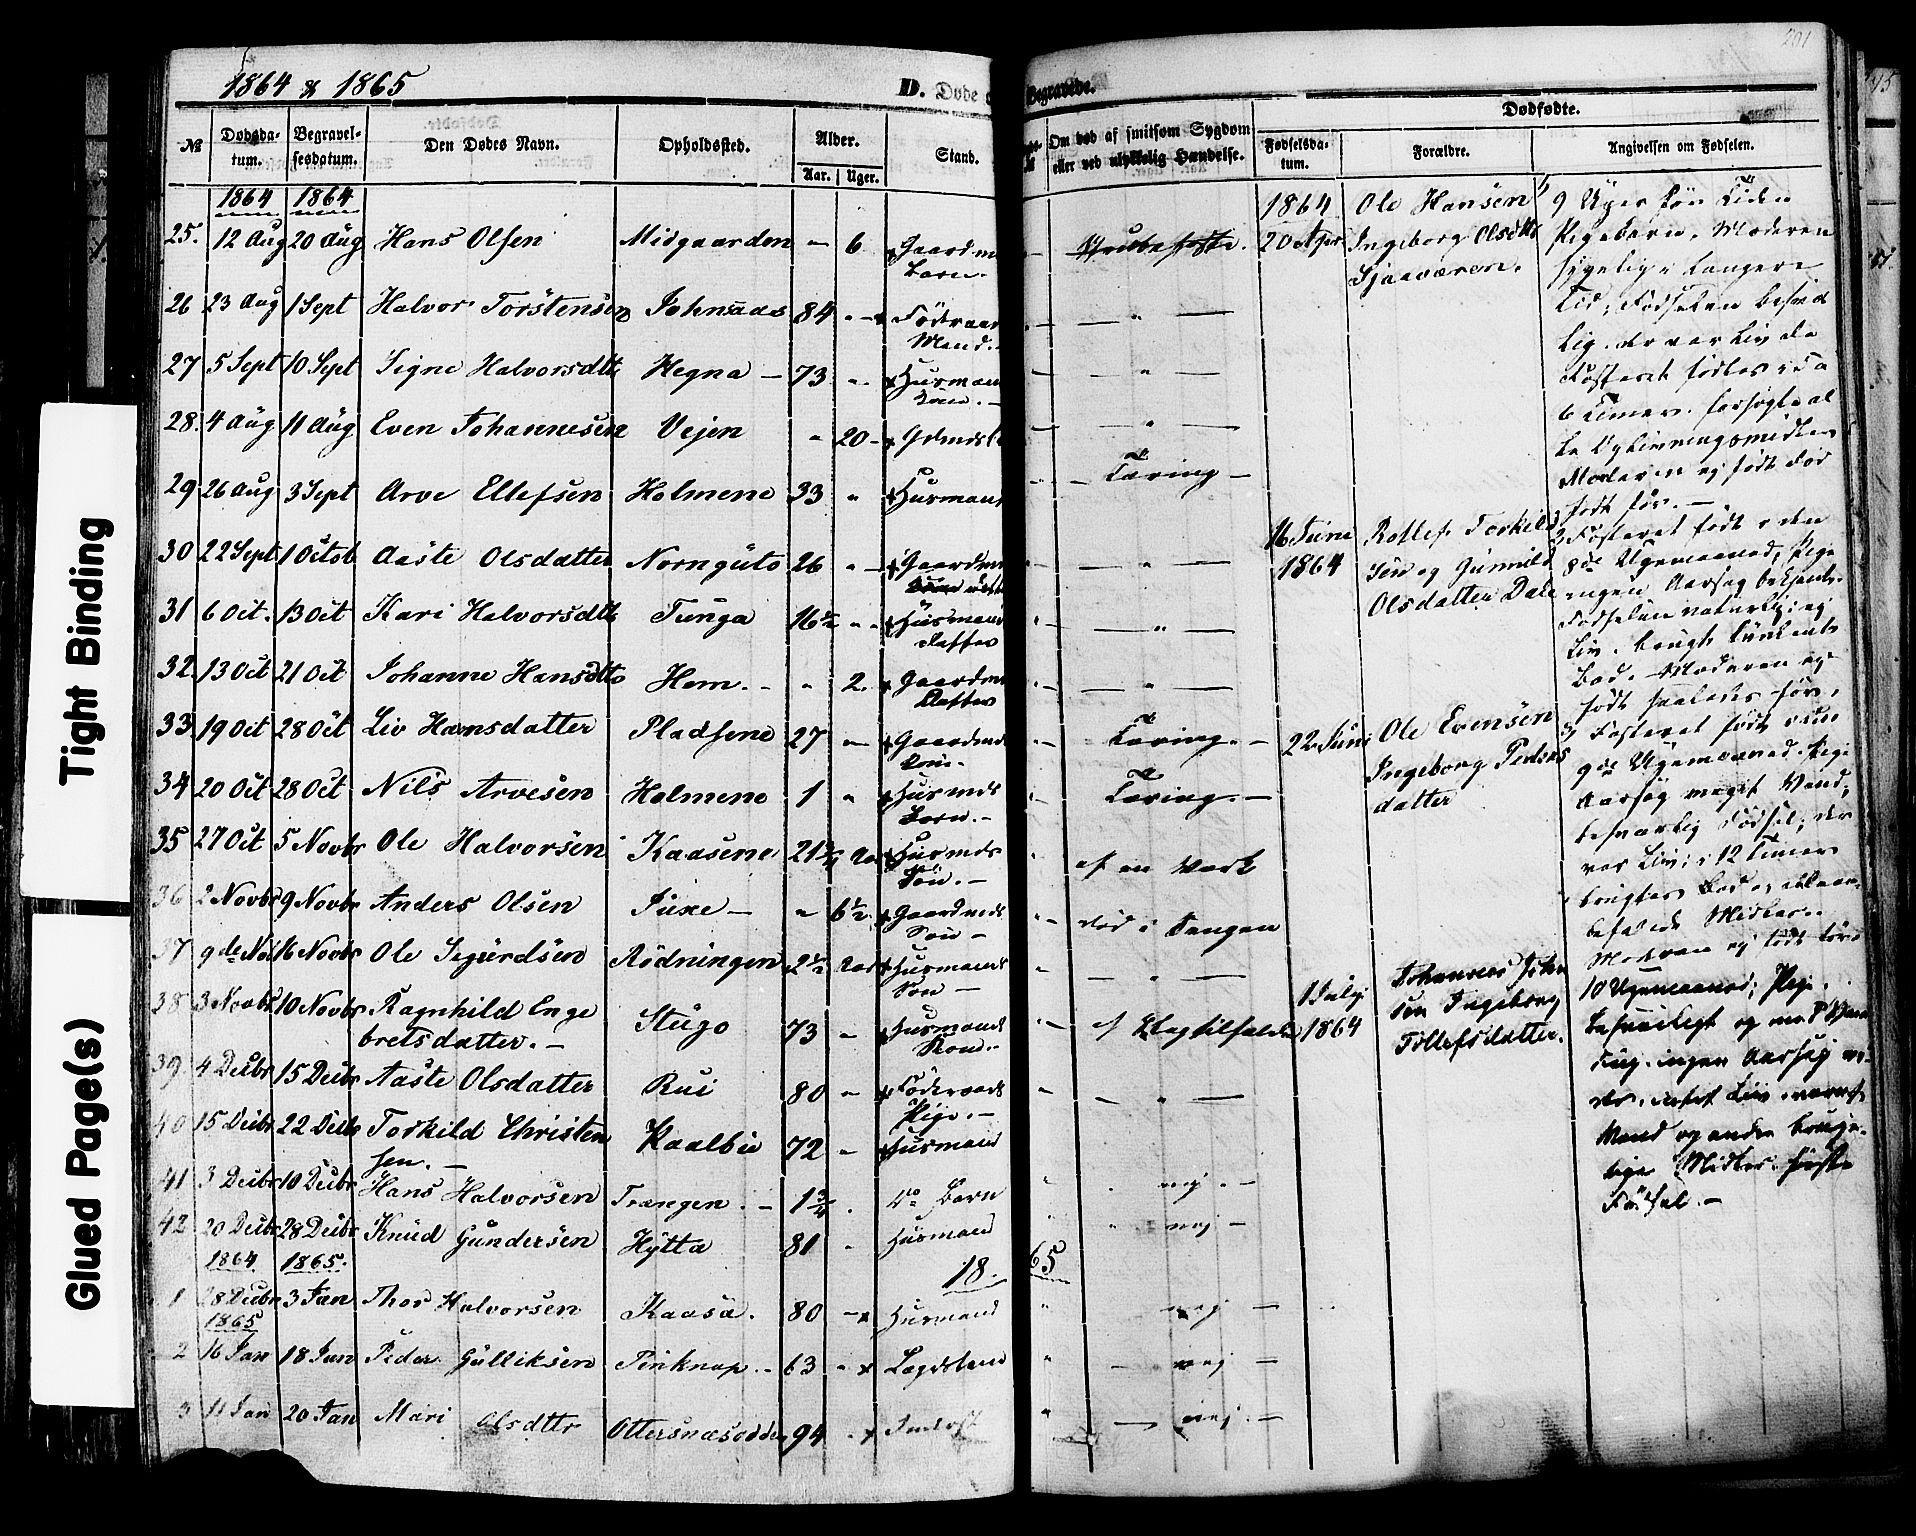 SAKO, Sauherad kirkebøker, F/Fa/L0007: Ministerialbok nr. I 7, 1851-1873, s. 201